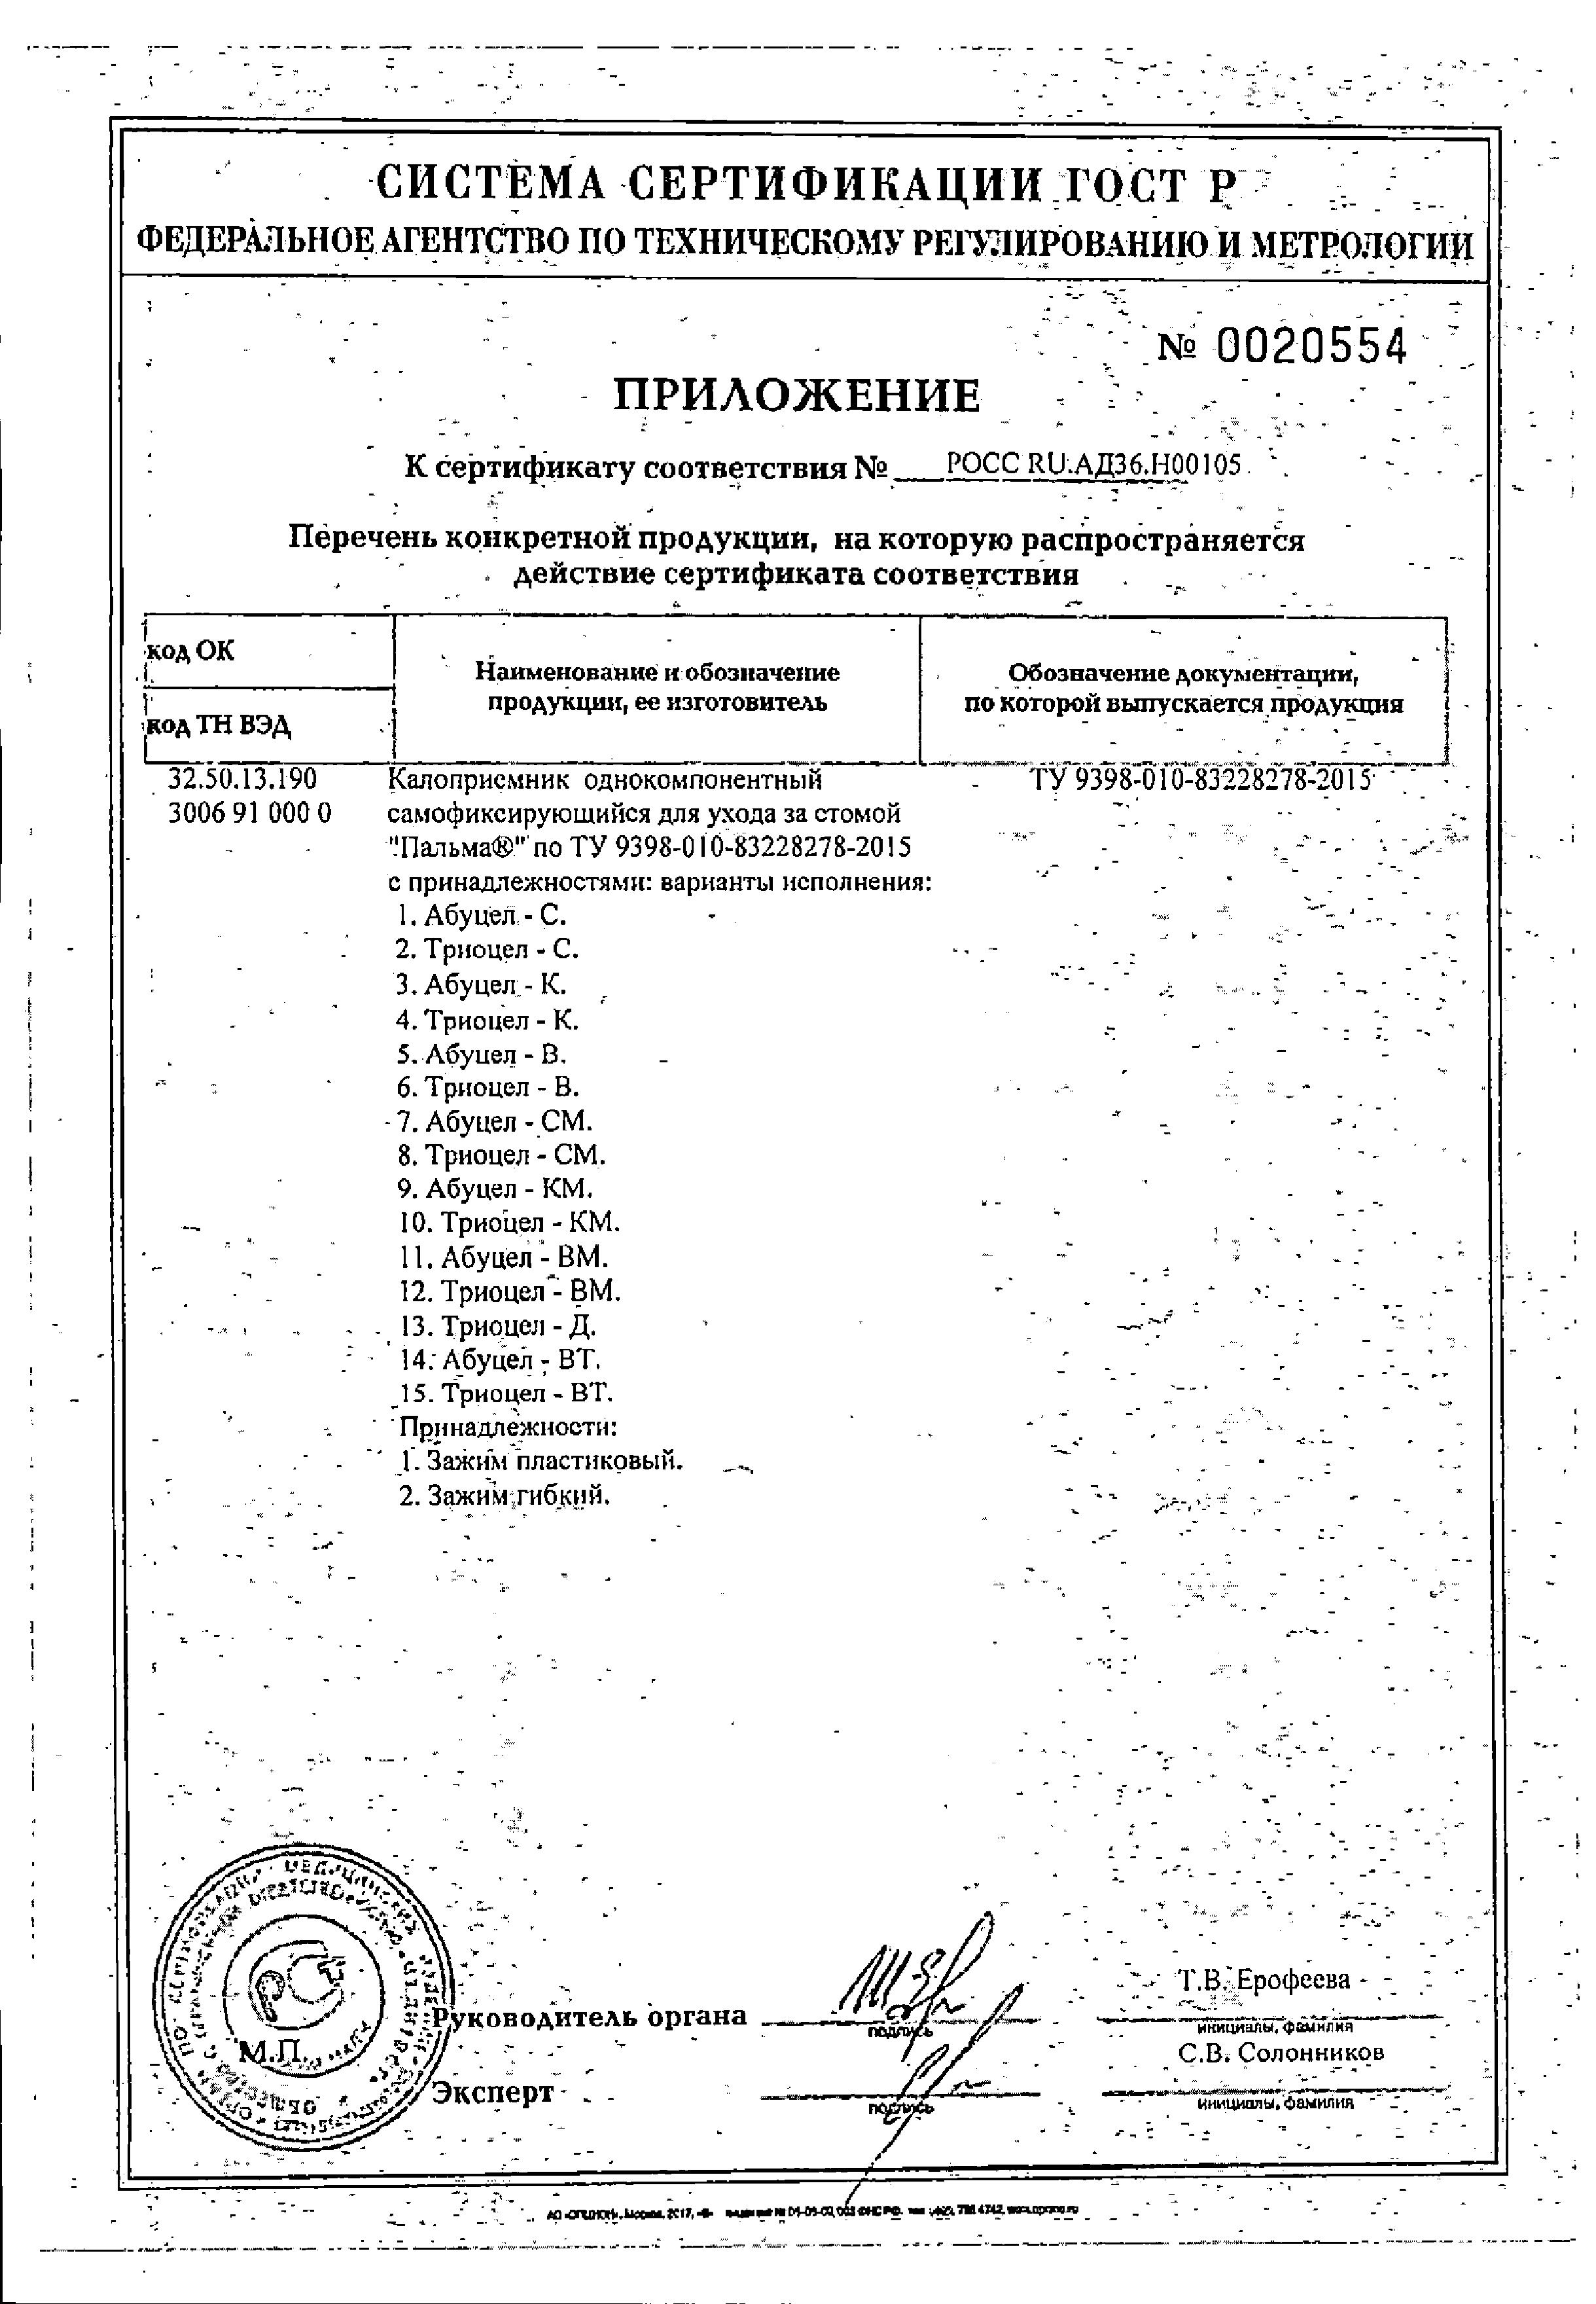 Калоприемники Абуцел-ВТ сертификат